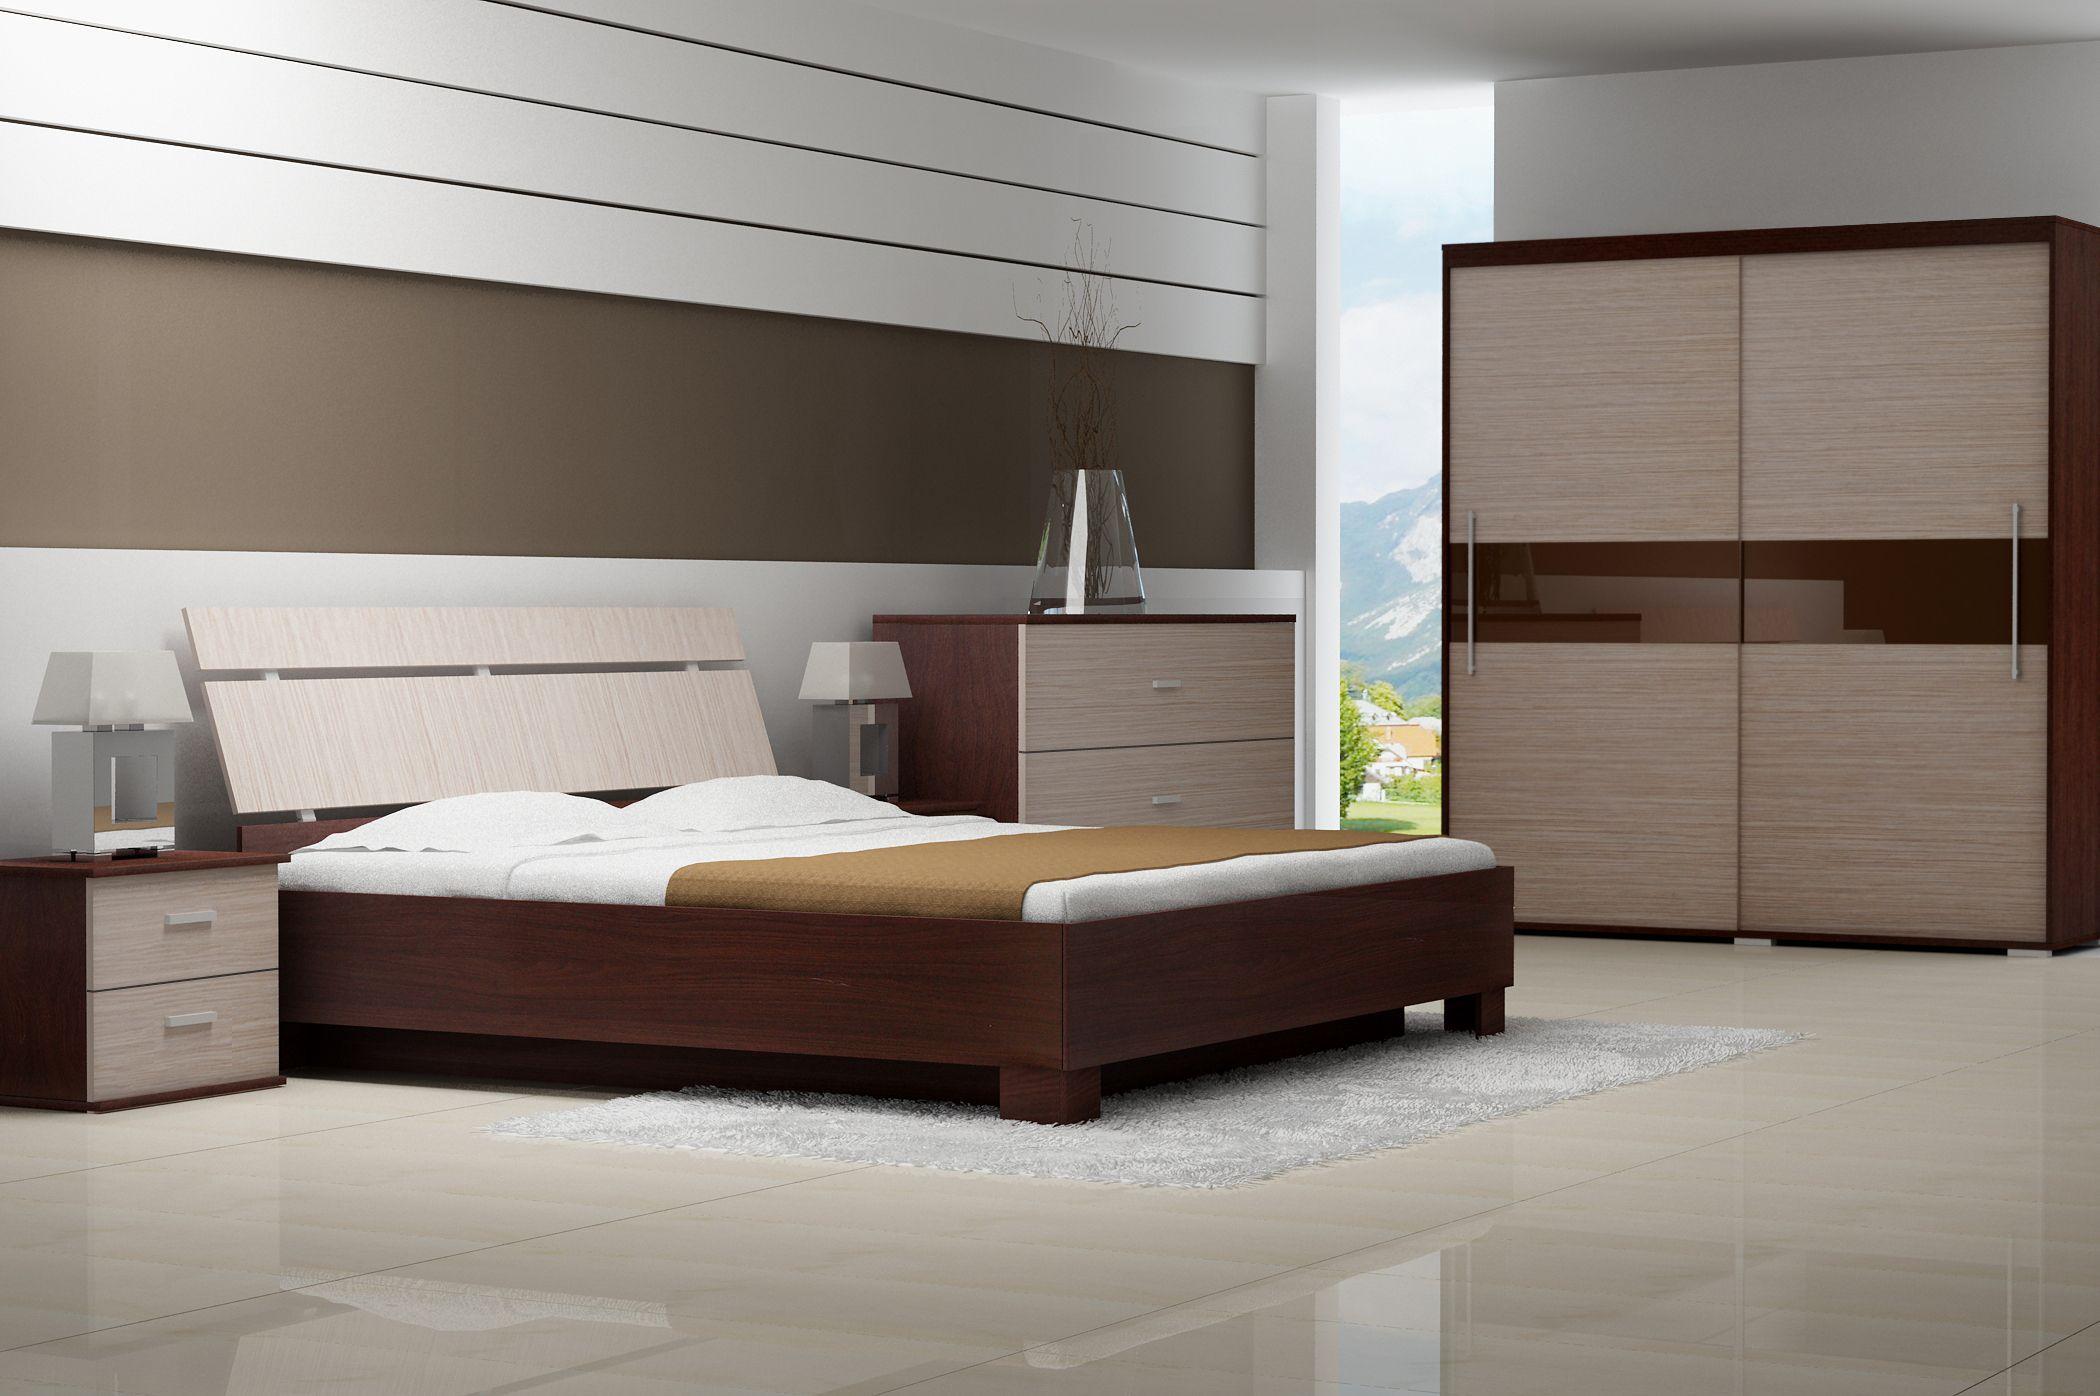 Best Of Comfortable Bedroom Chairs